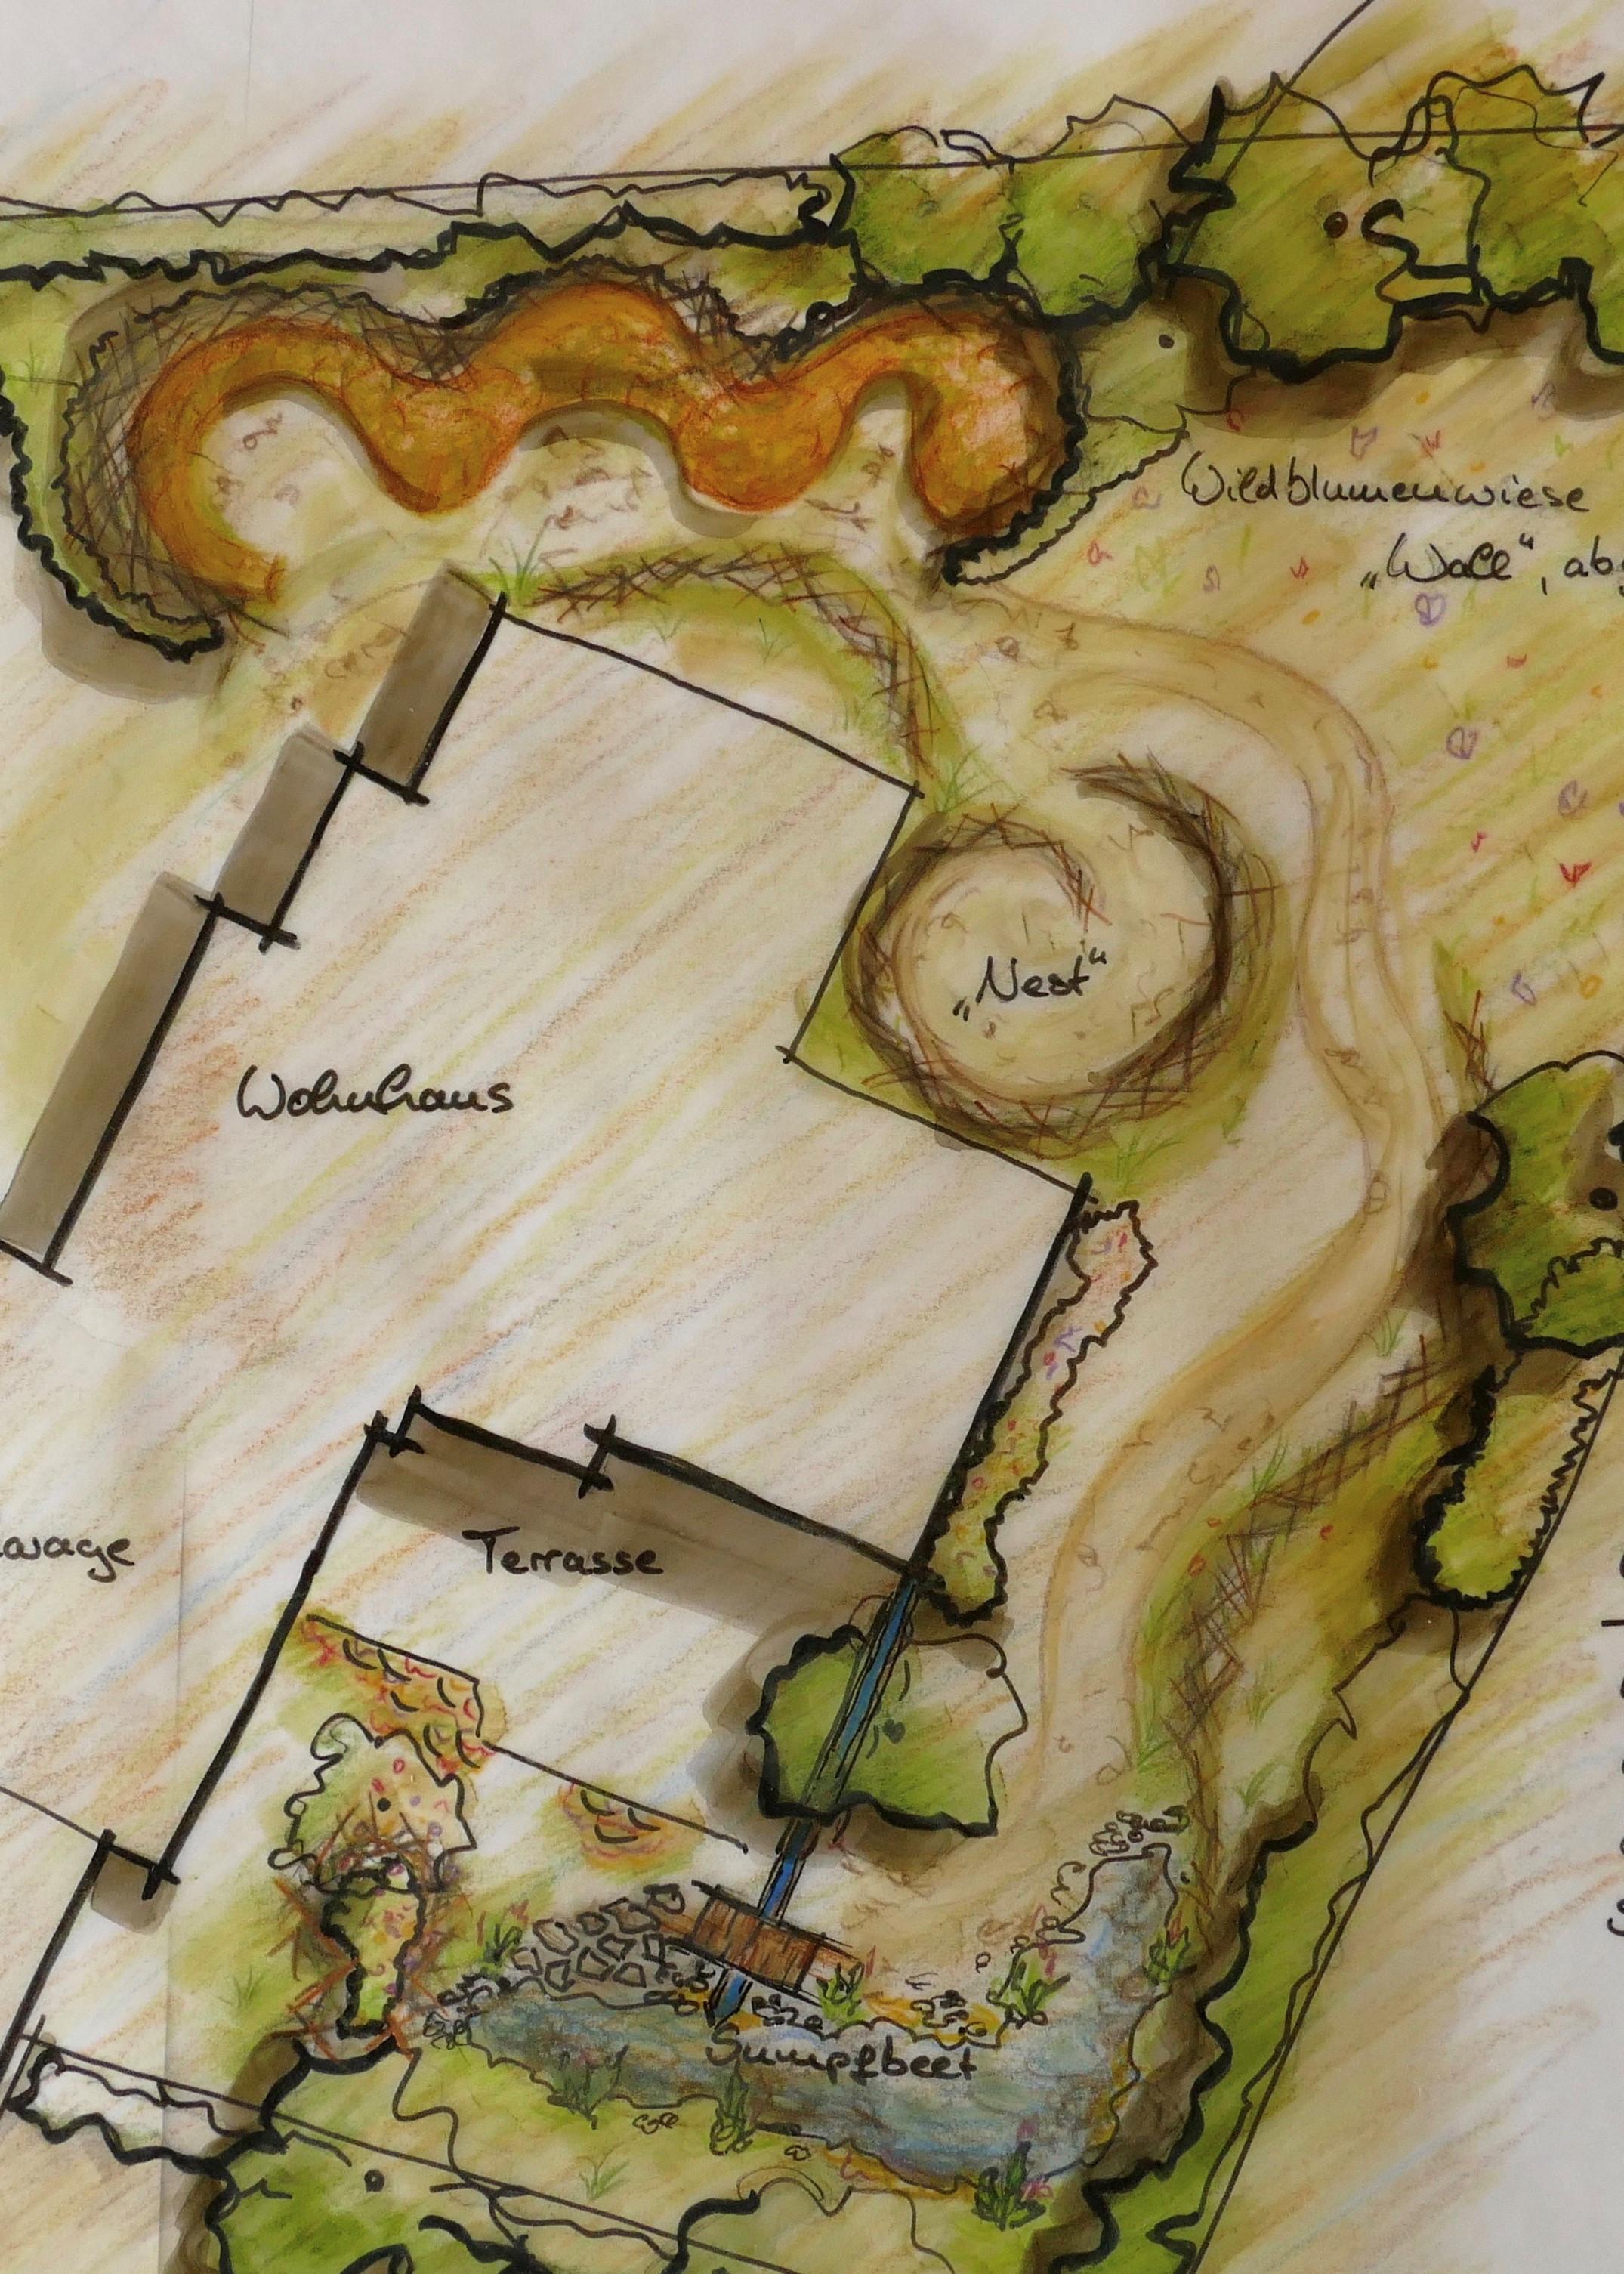 Naturgarten- oder Permakulturberatung